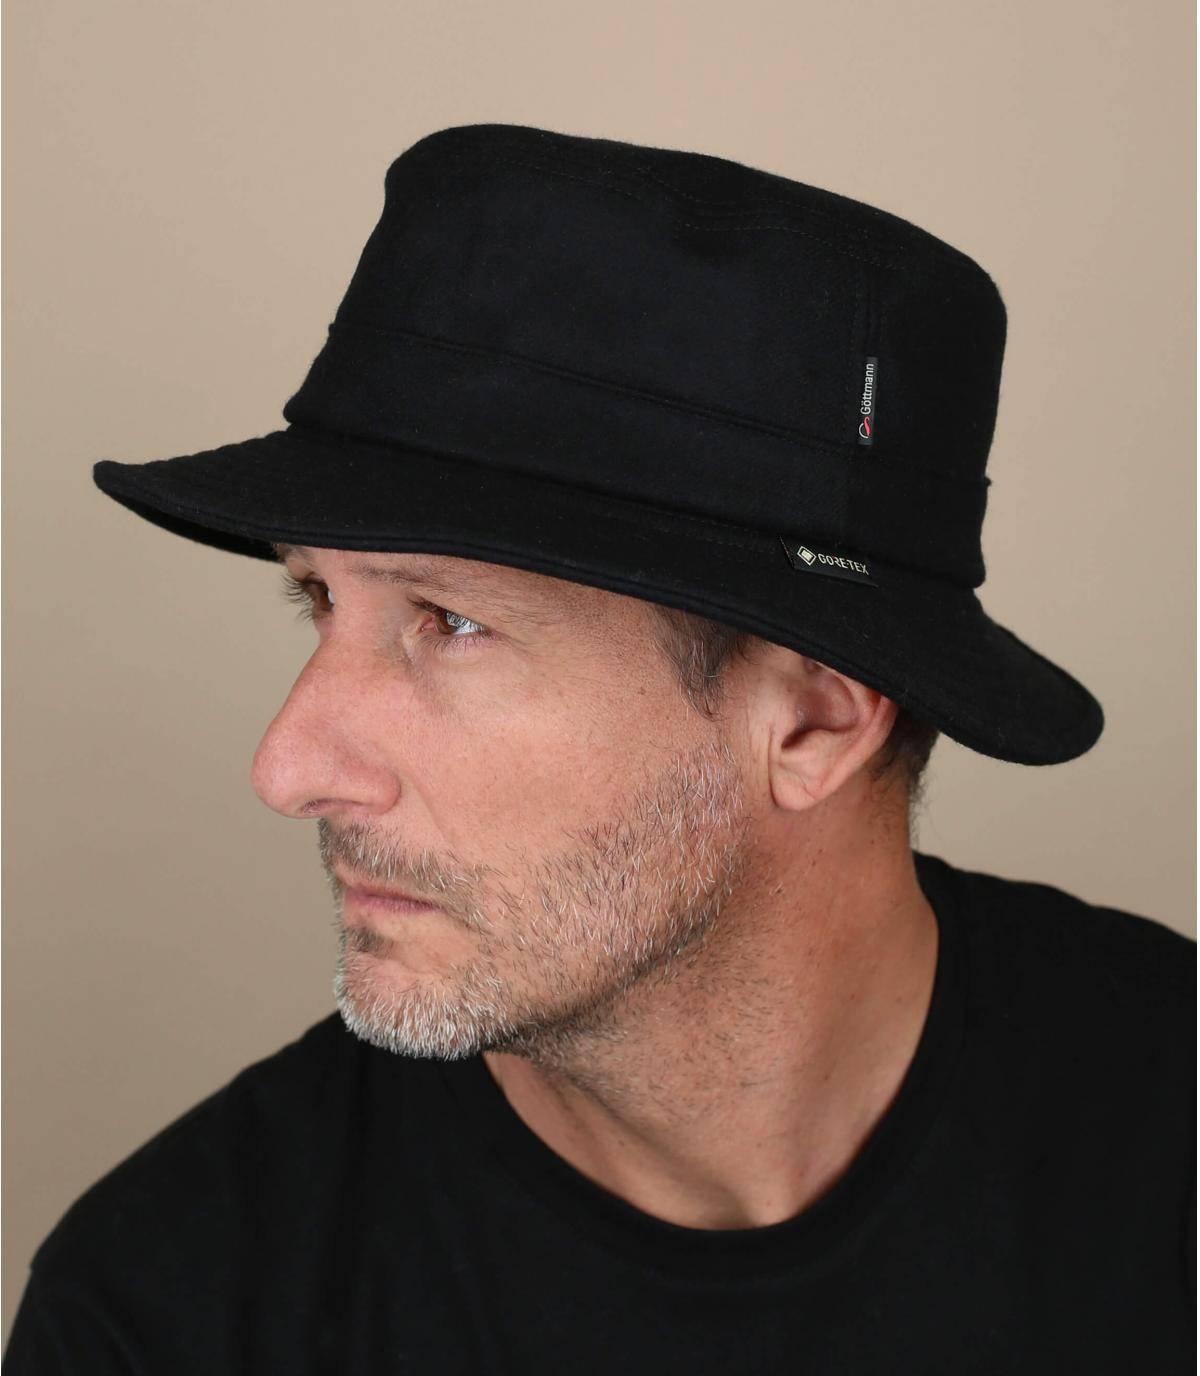 Gore-Tex wool cap